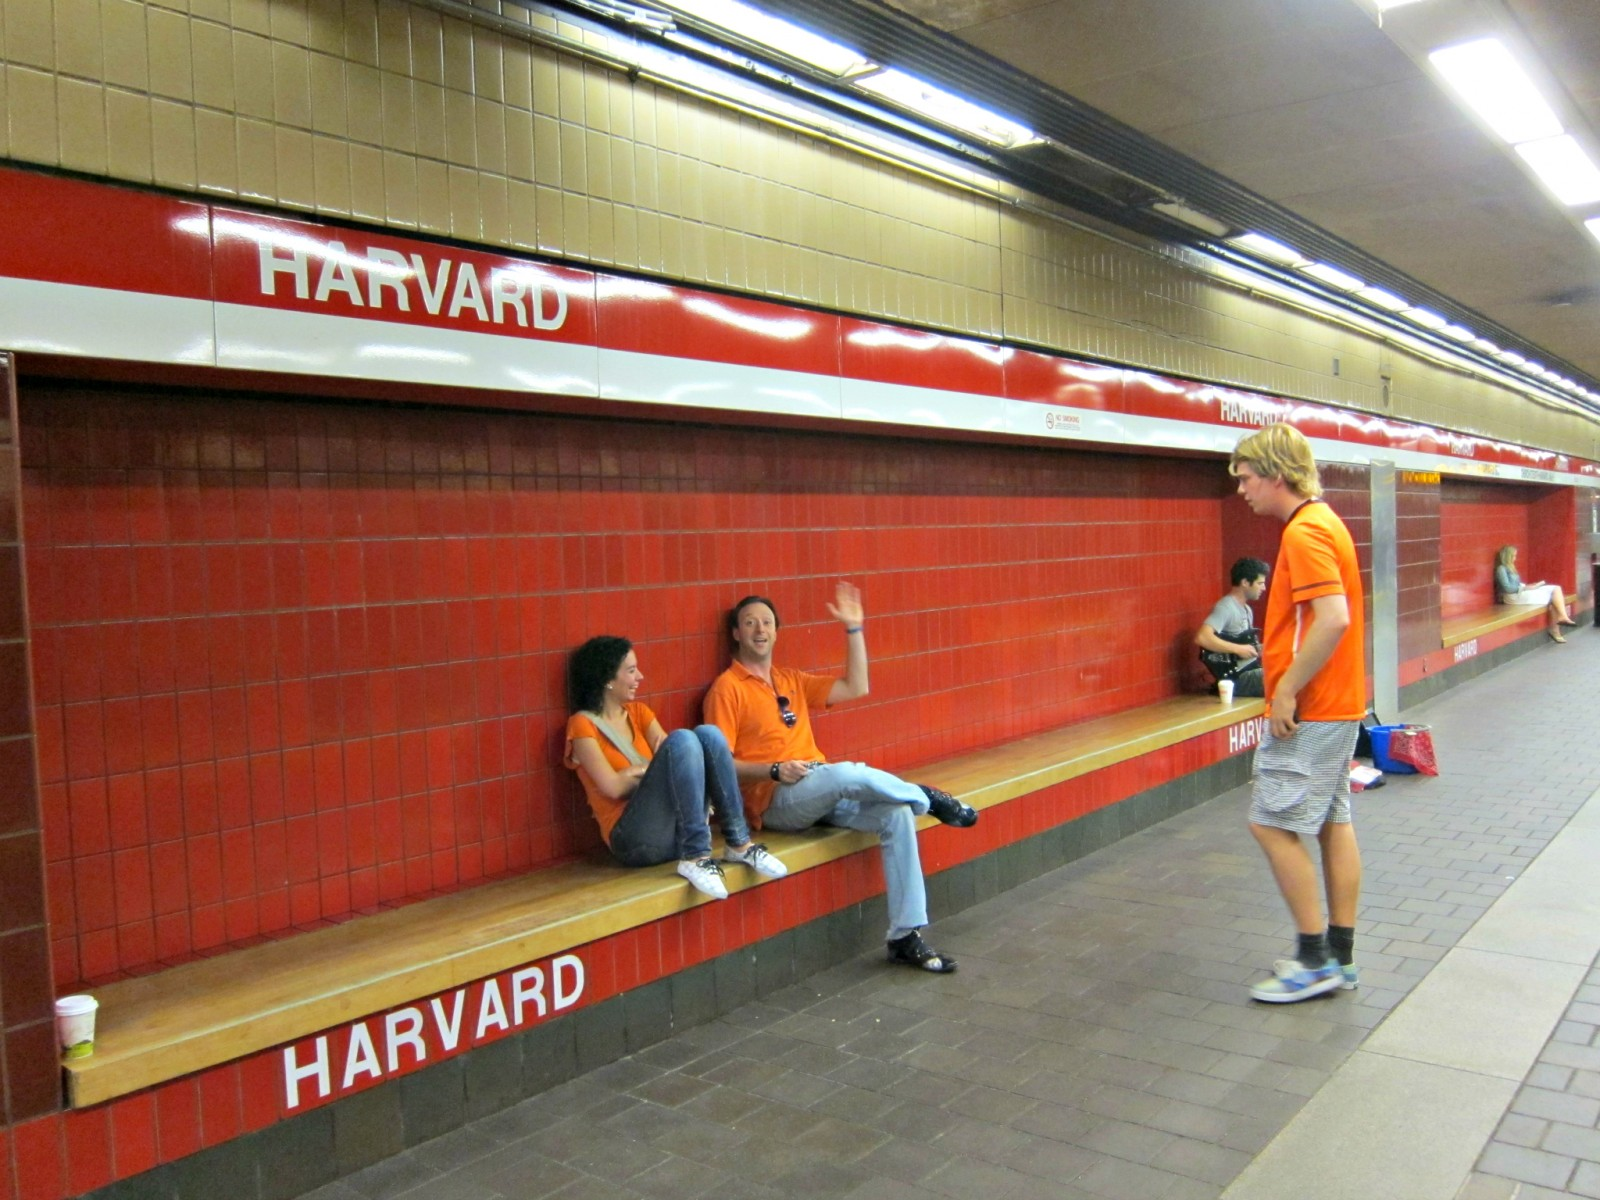 Harvard: I Got Sunshine